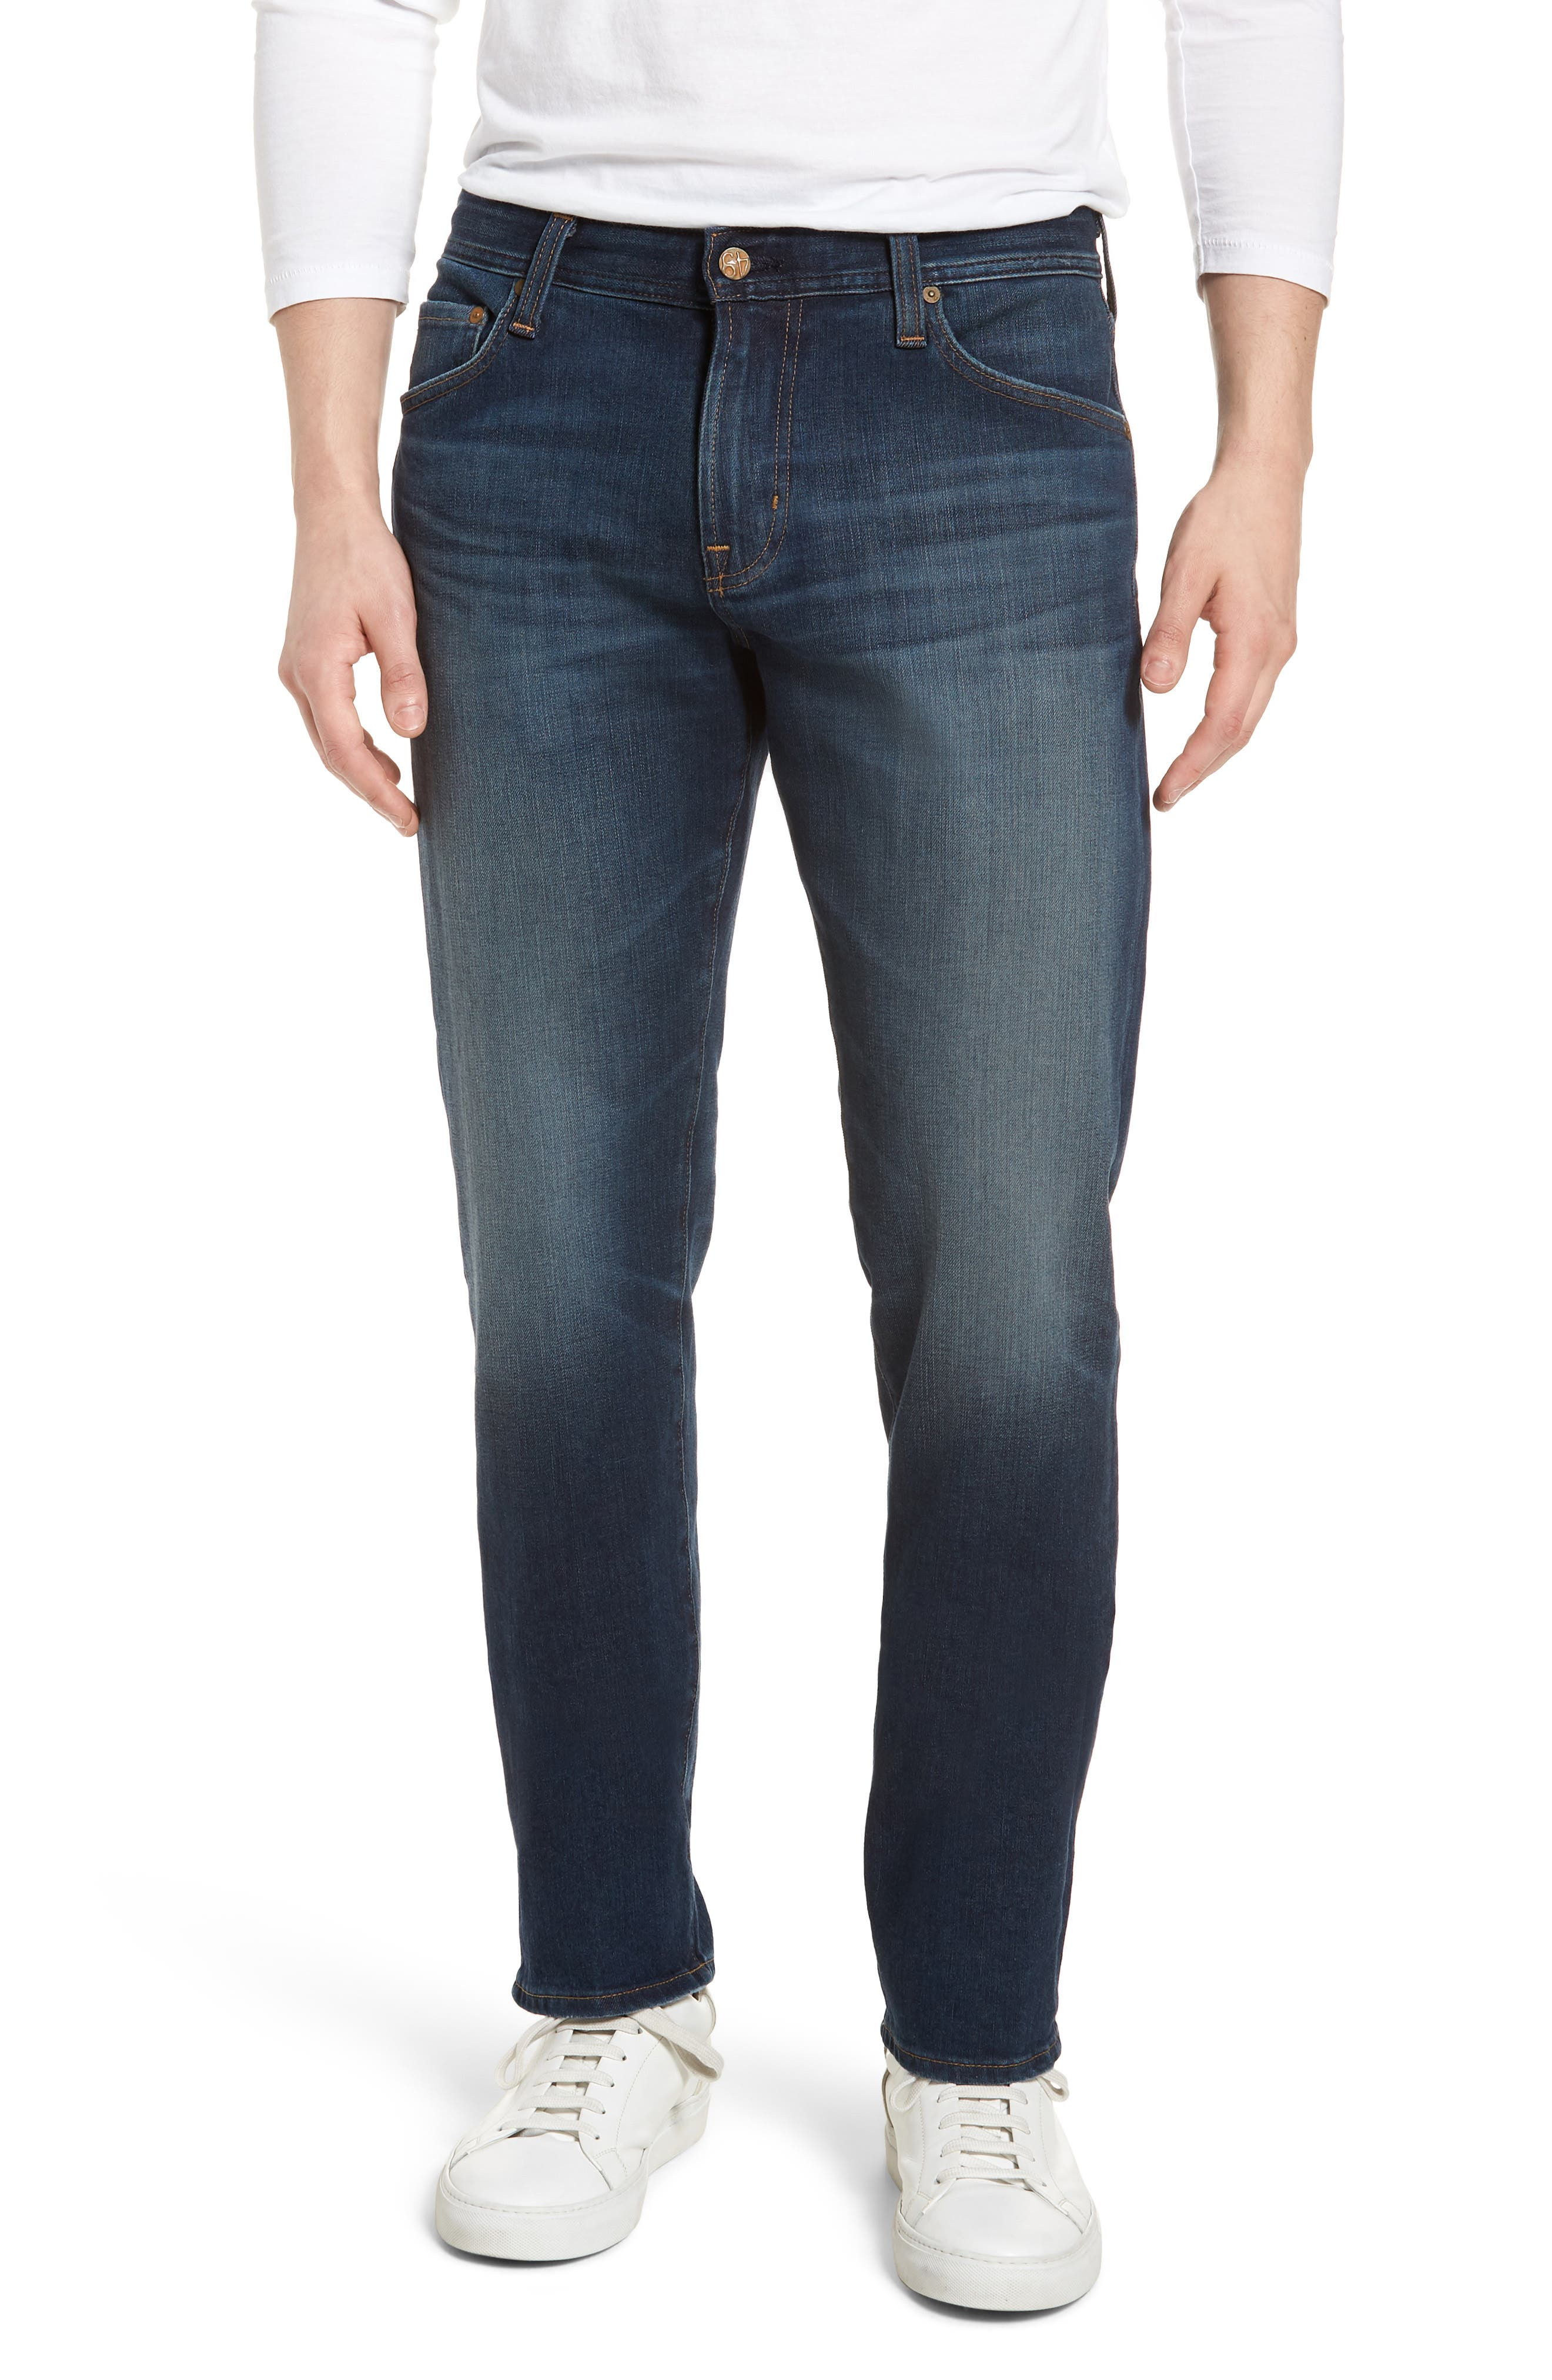 Graduate Slim Straight Leg Jeans,                         Main,                         color,